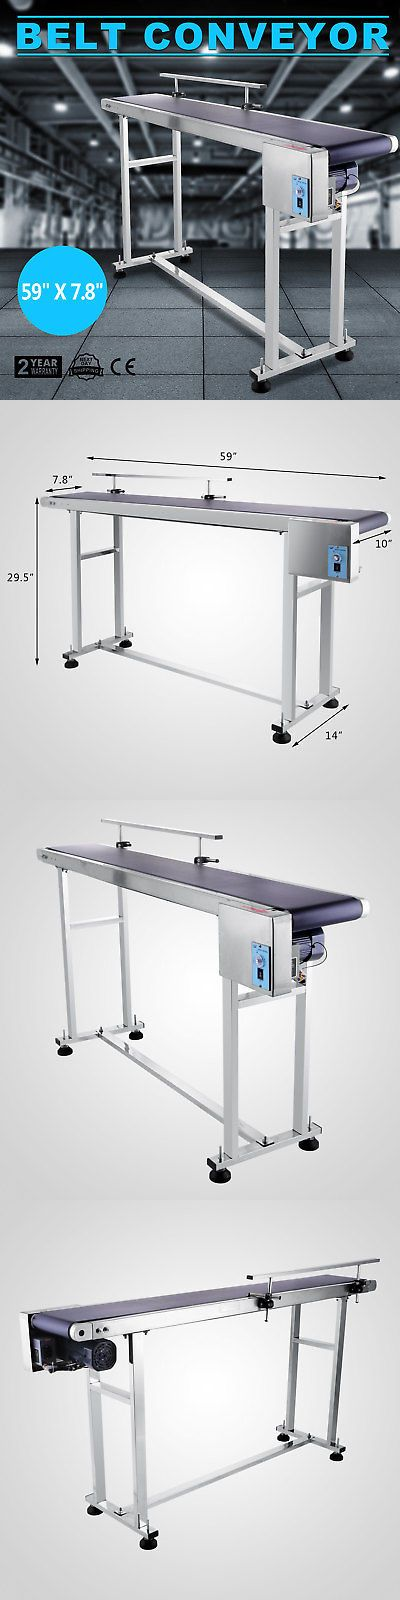 Belt Conveyors 131199: Top-Grade Conveyor 110V Powered